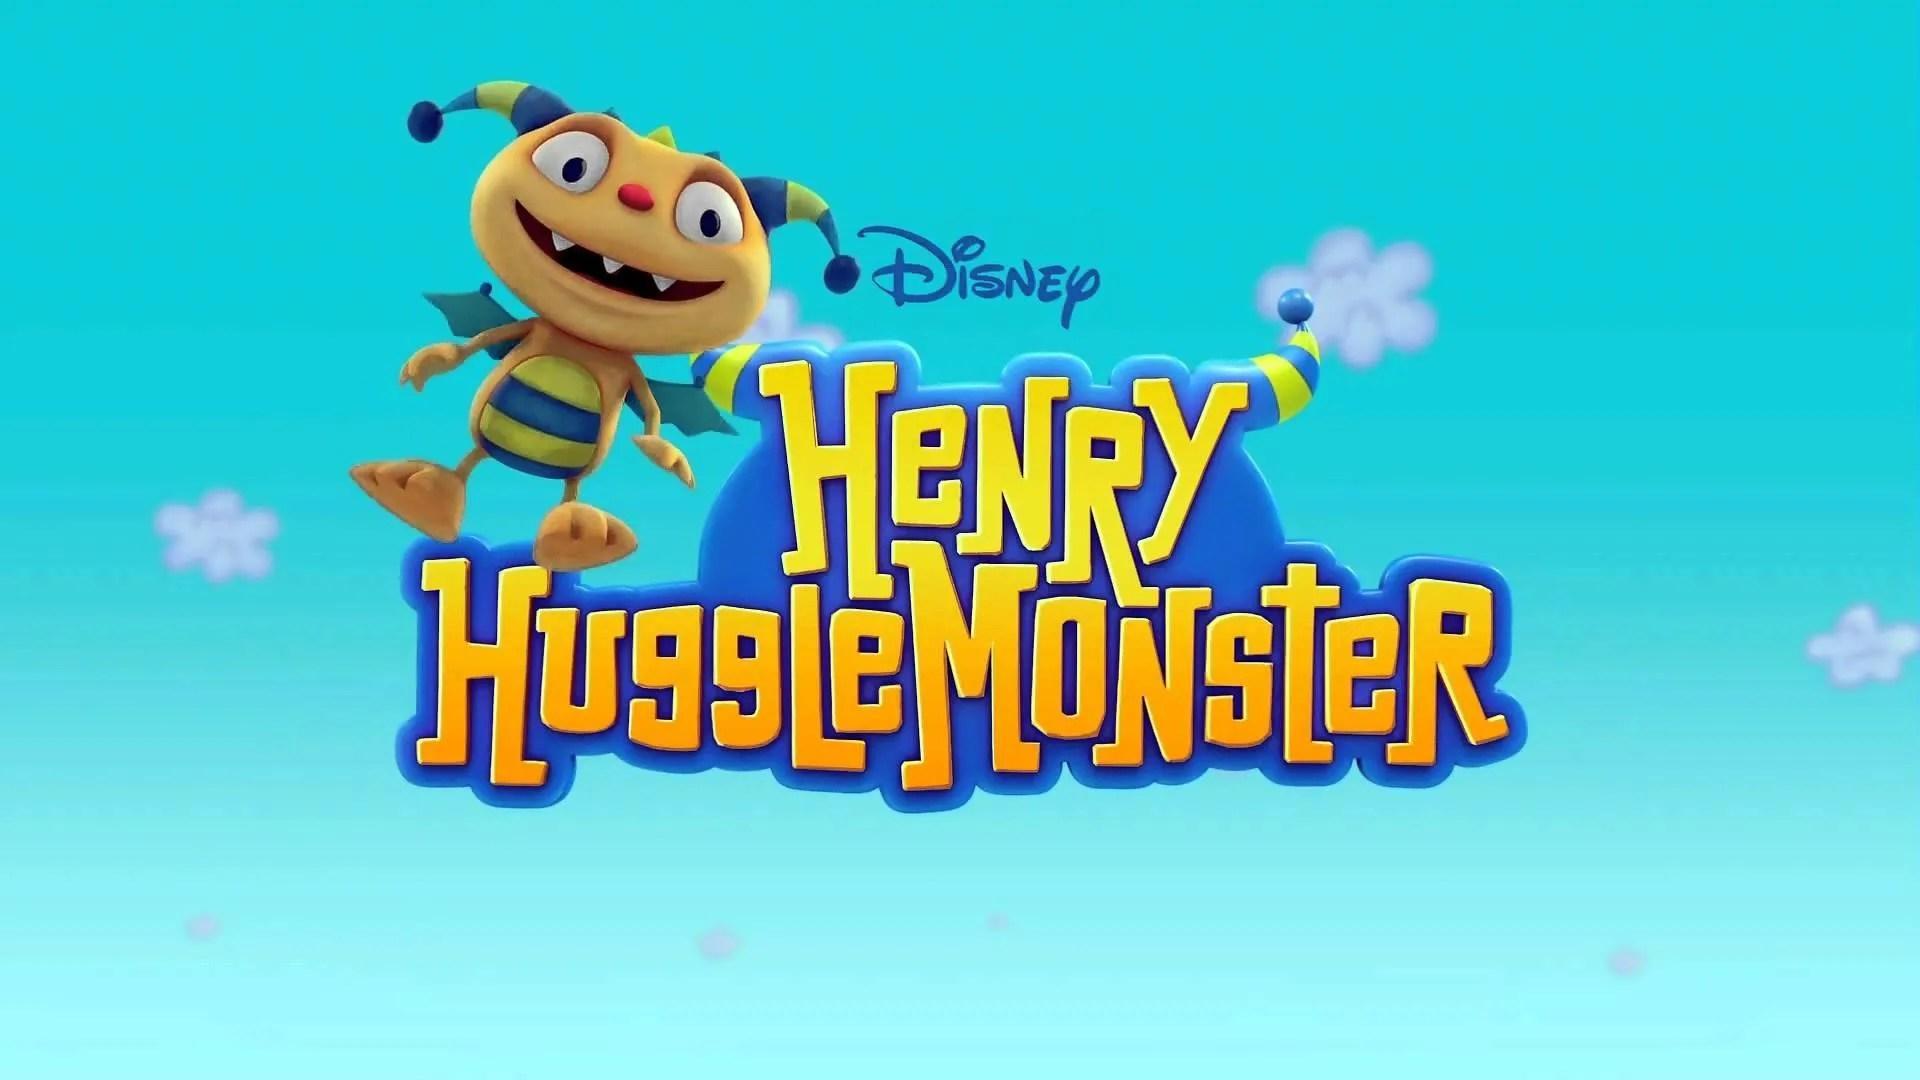 Disney Cartoon Characters Wallpapers In 3d Henry Hugglemonster Western Animation Tv Tropes